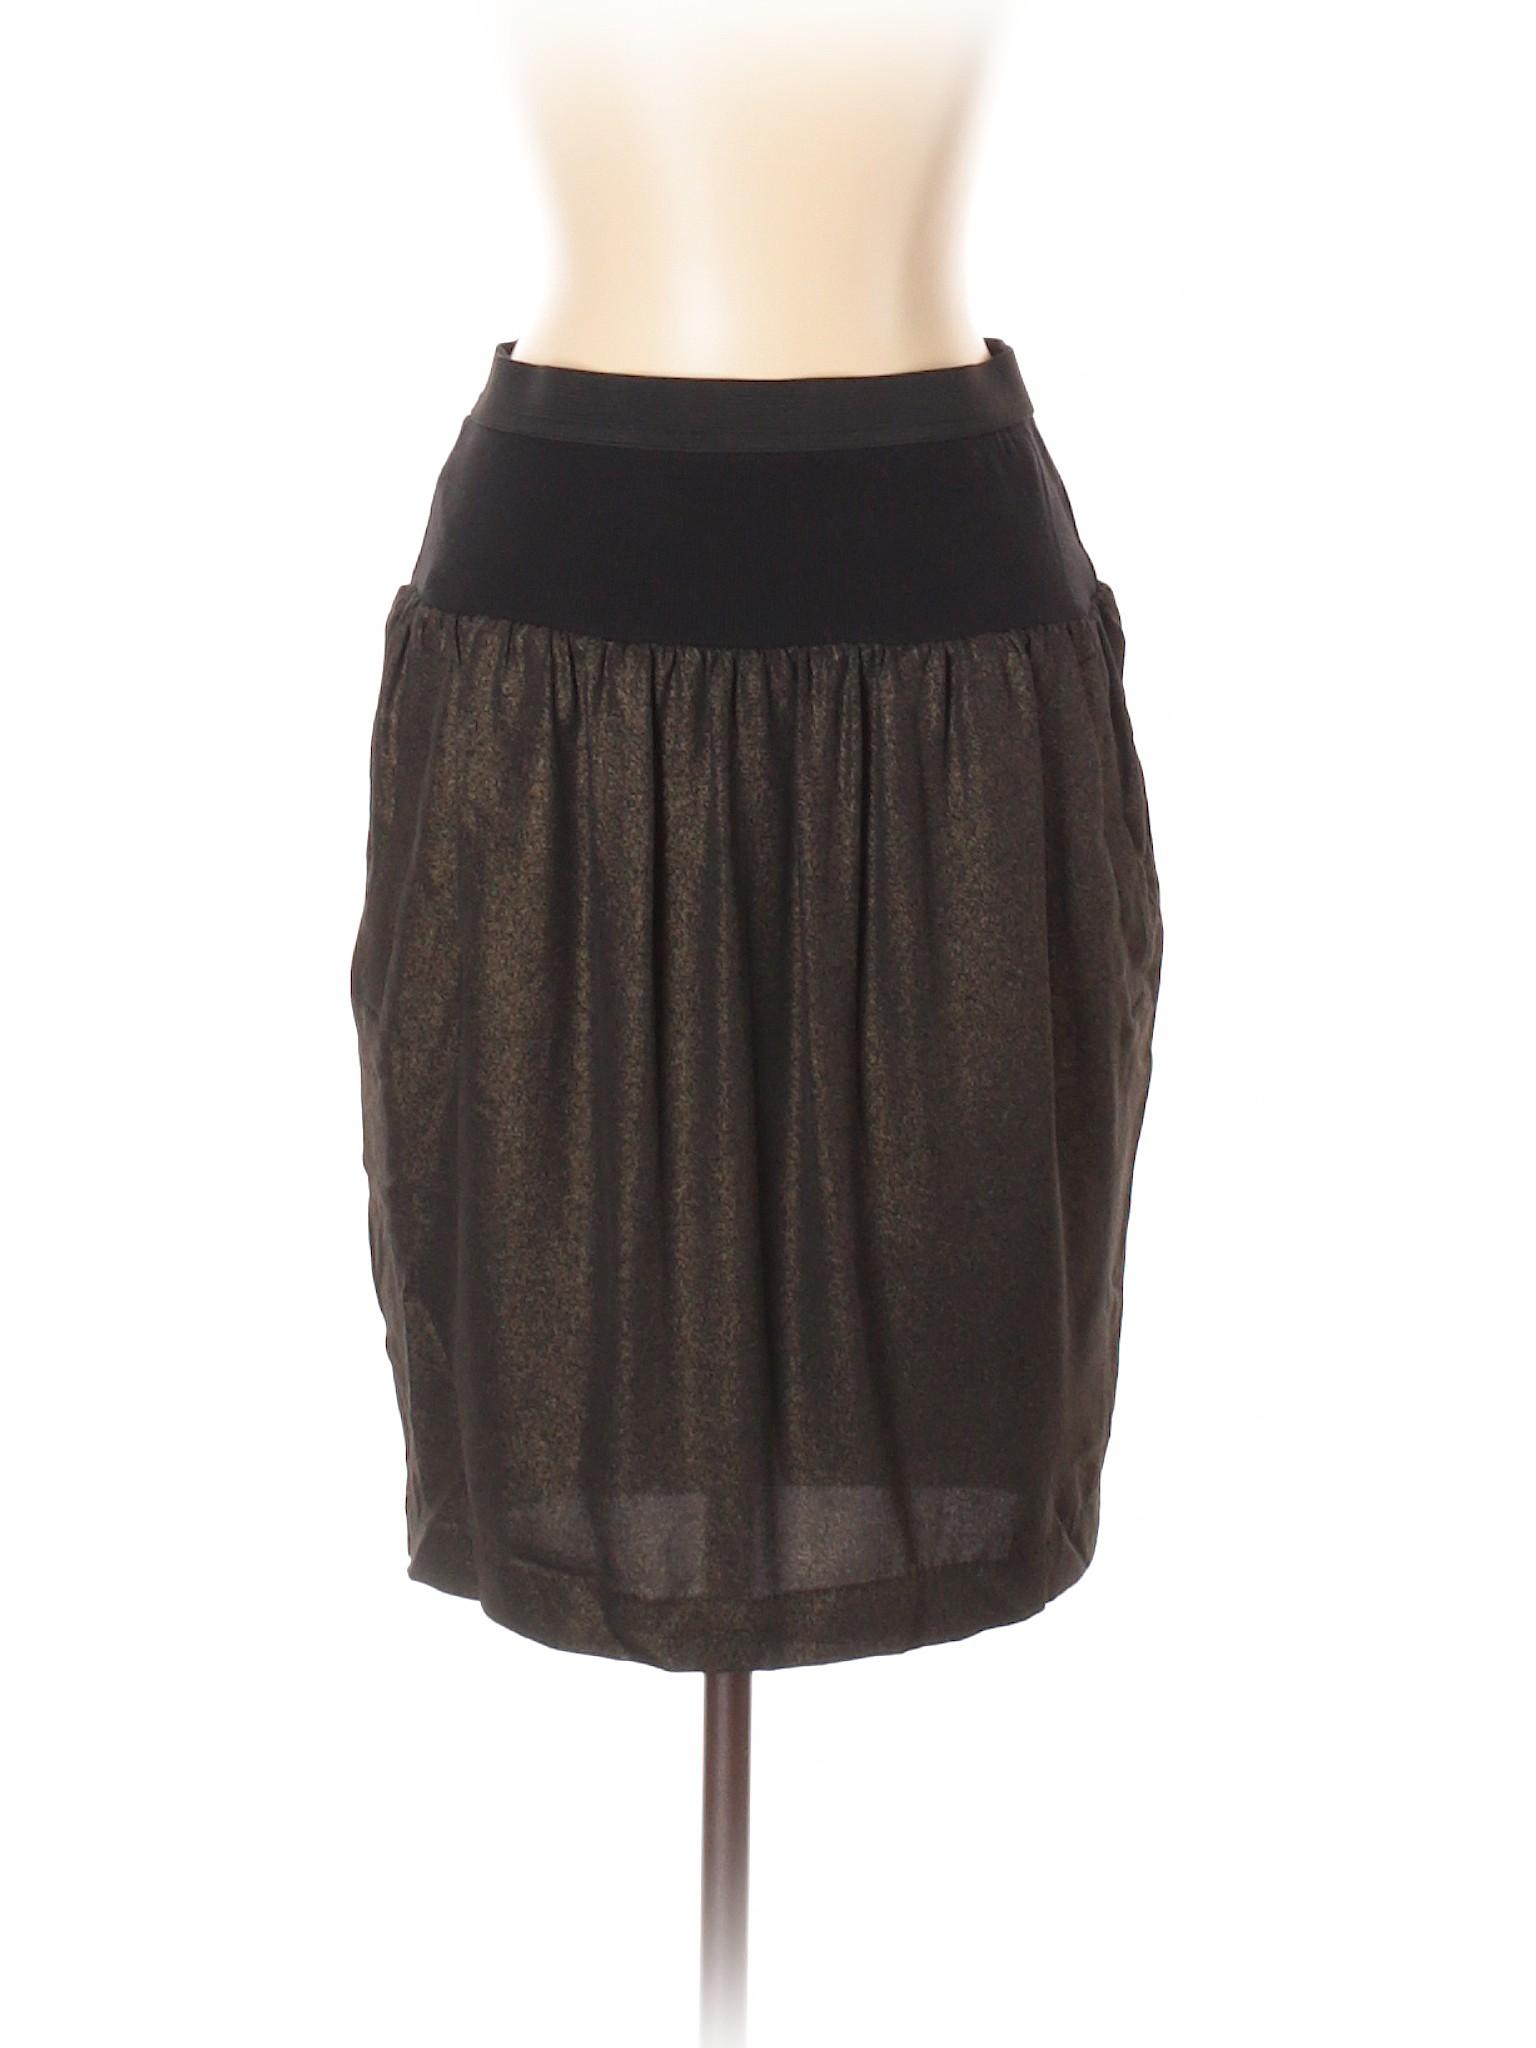 Boutique Skirt Birger Malene Silk By 1qgPw6